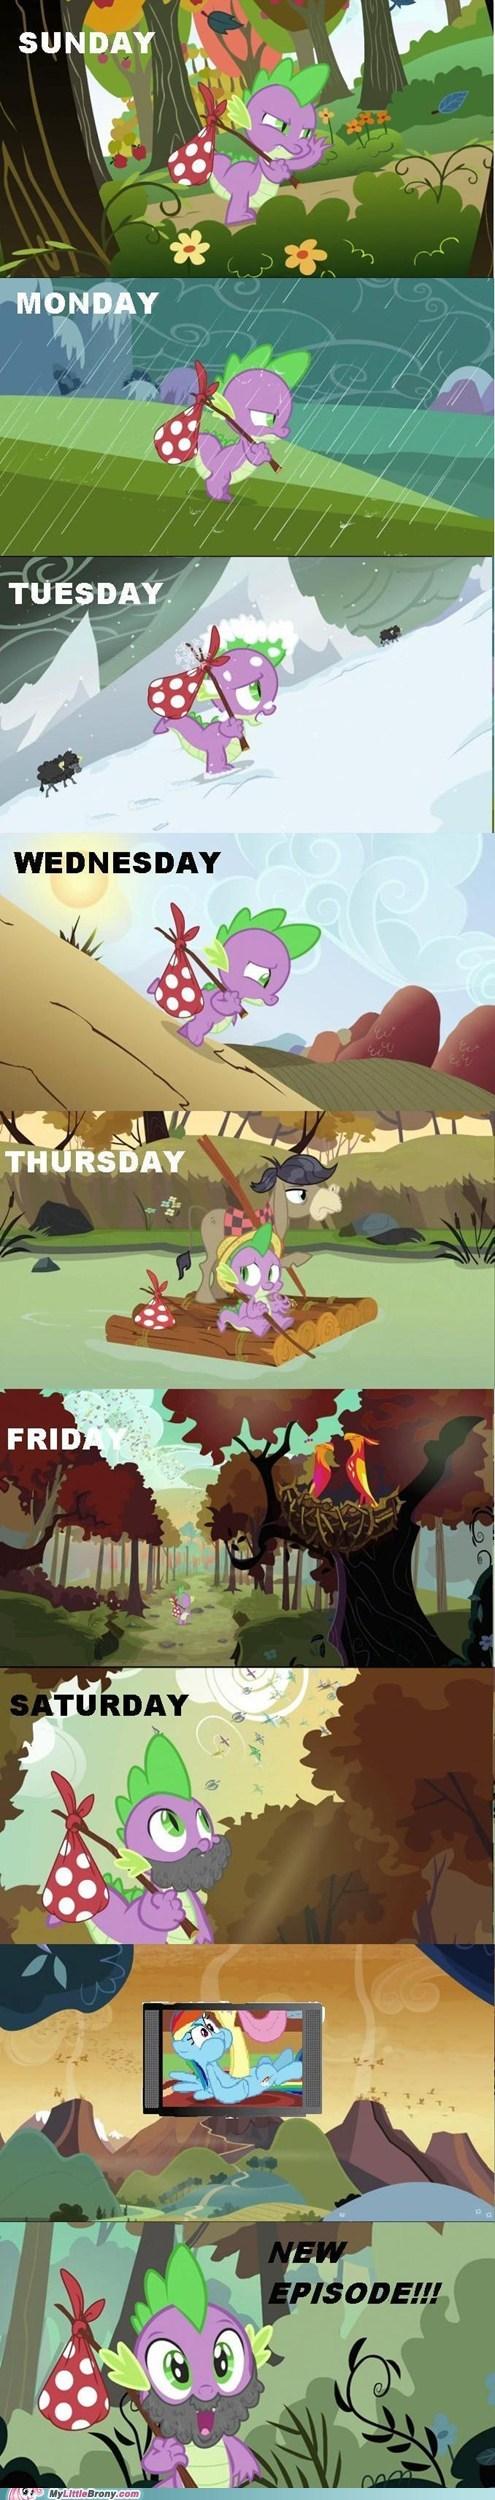 a journey,all week,comic,comics,new episode,spike,waiting